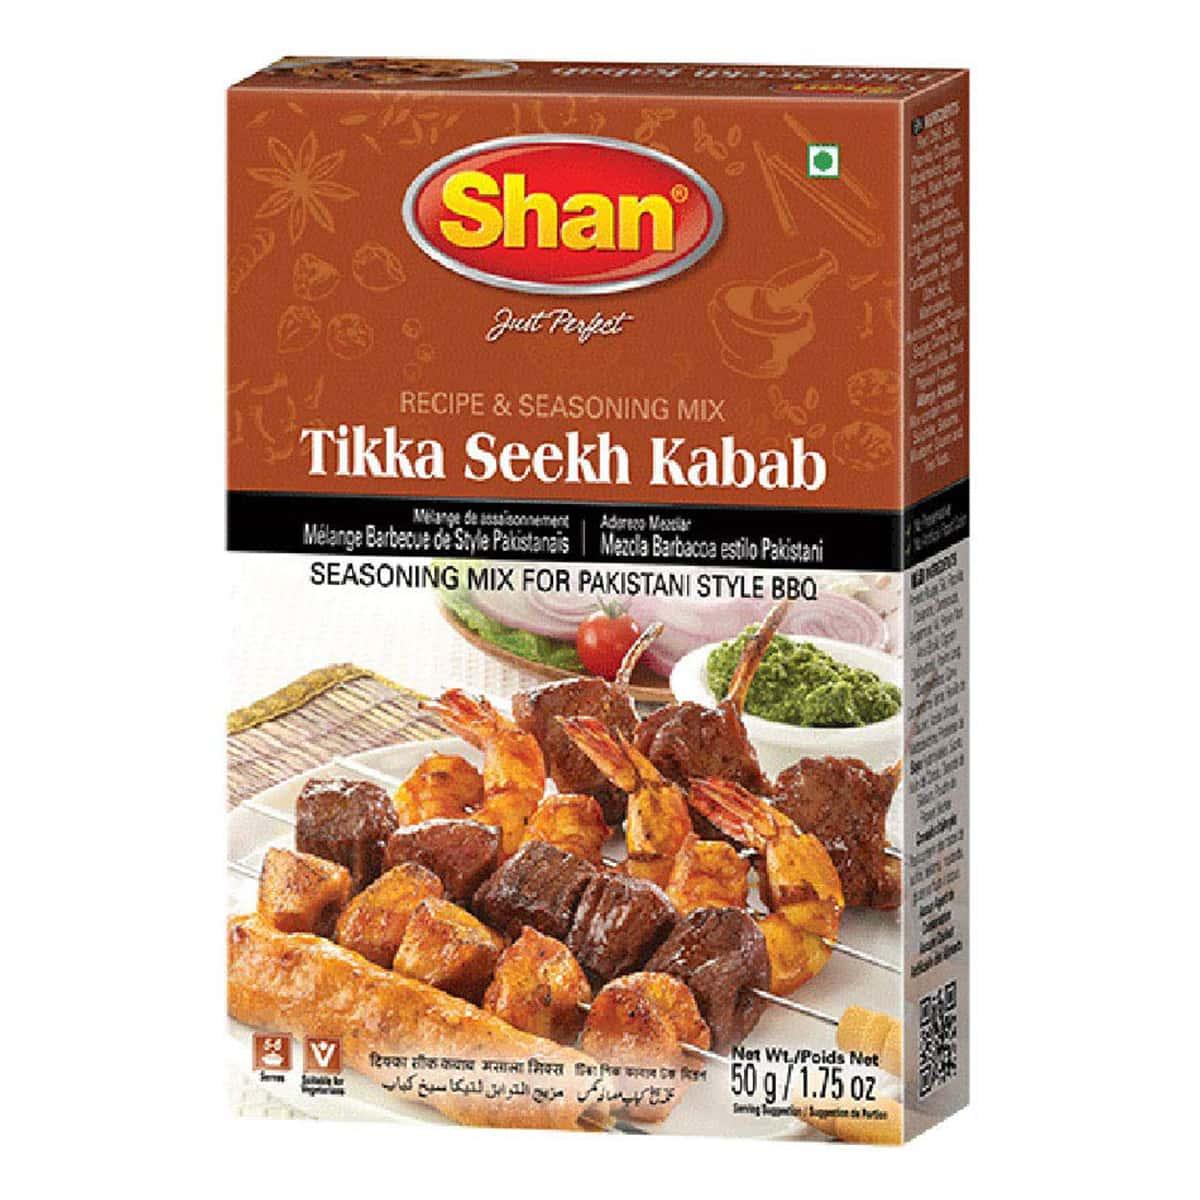 Buy Shan Tikka Seekh Kabab Bbq Mix - 50 gm